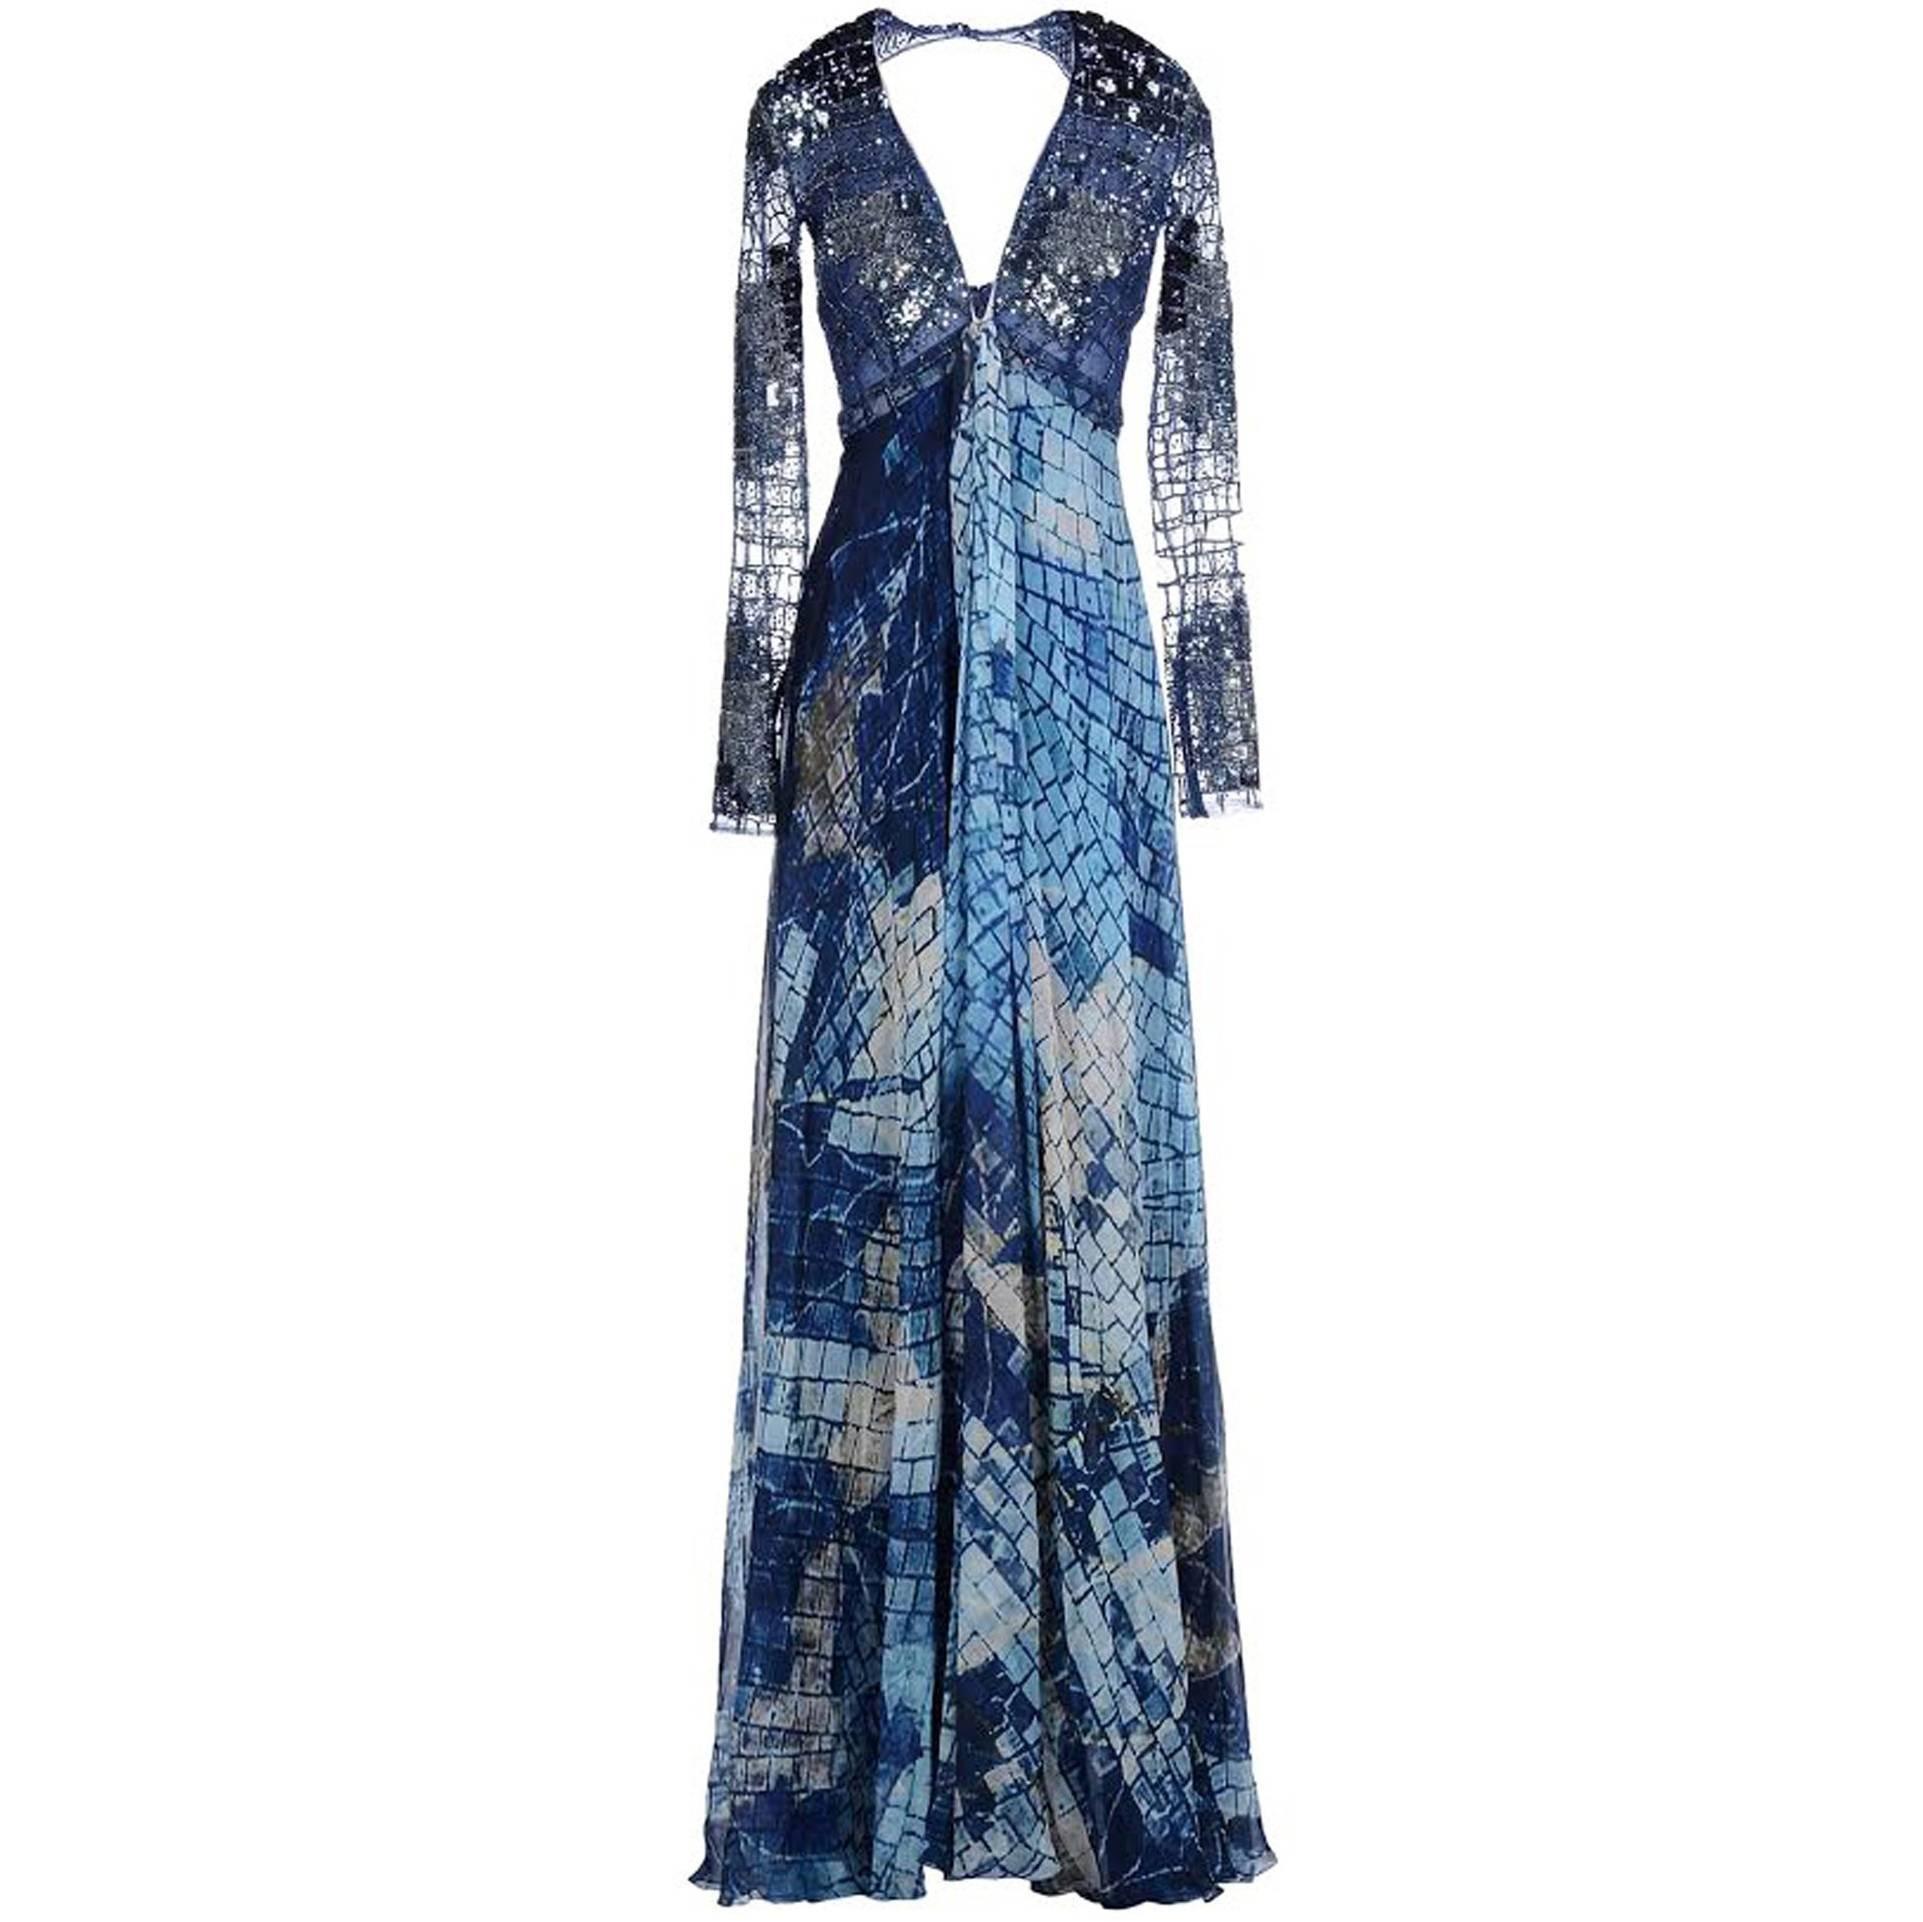 New ZUHAIR MURAD Embellished Ocean Blue Silk Gown It. 38 - US 2